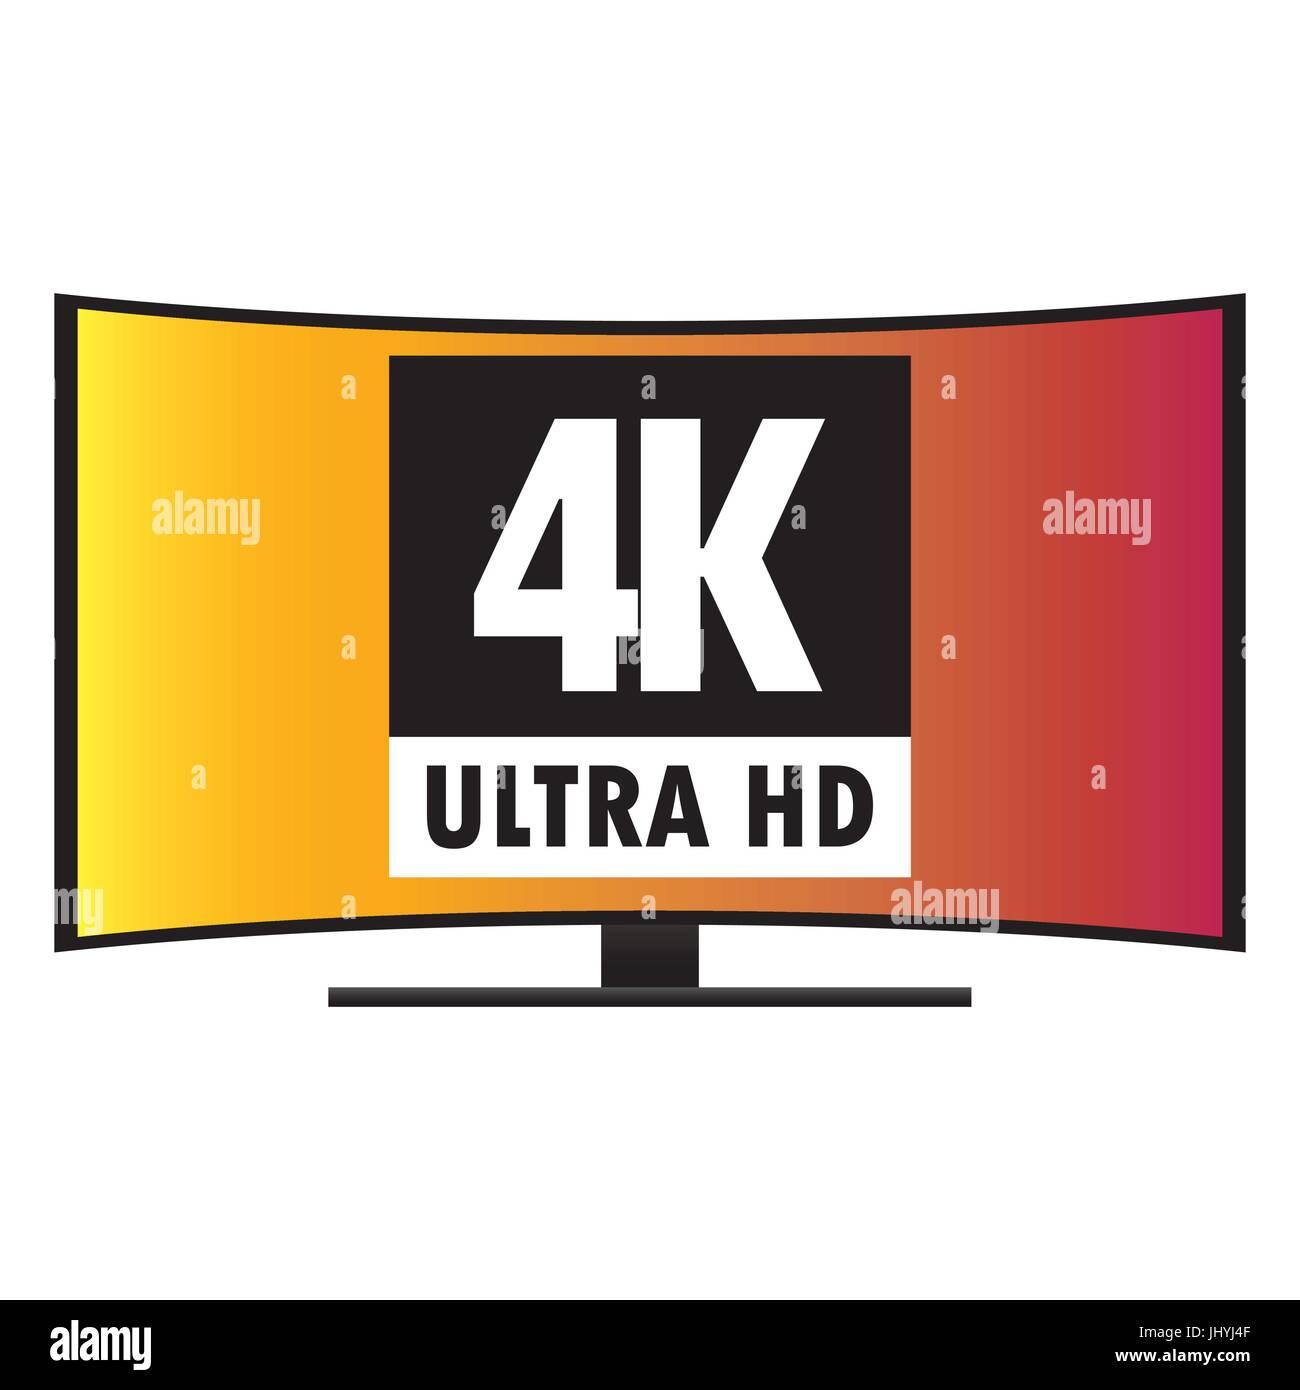 4K Ultra HD Modern Curved Screen Smart TV, vector - Stock Image